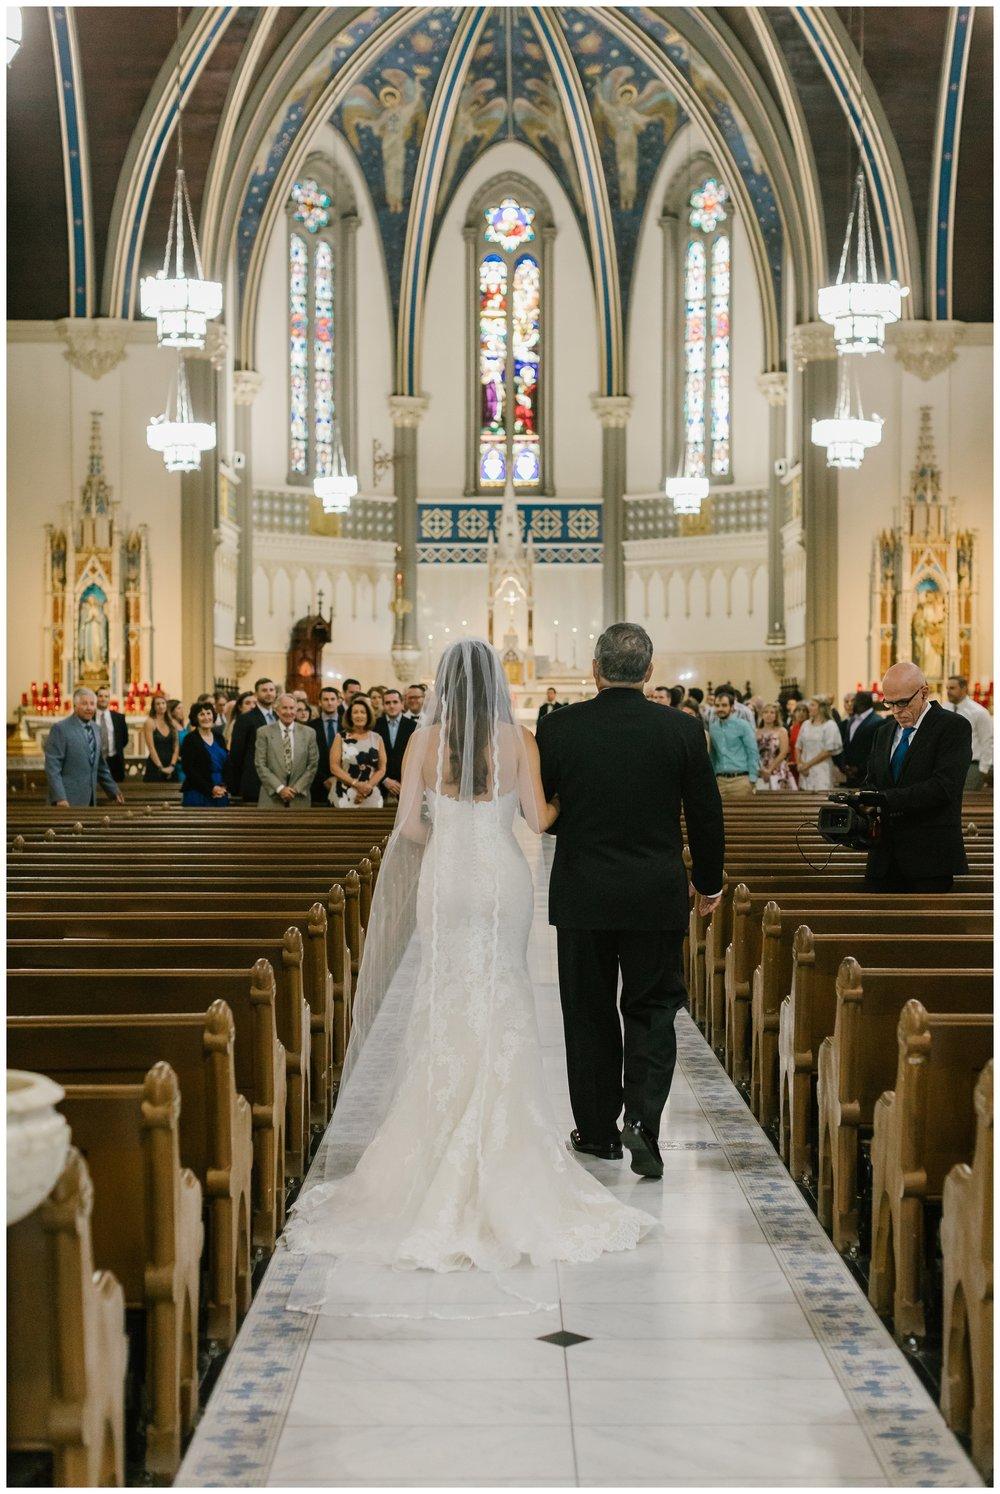 Rebecca_Bridges_Photography_Indianapolis_Wedding_Photographer_6800.jpg